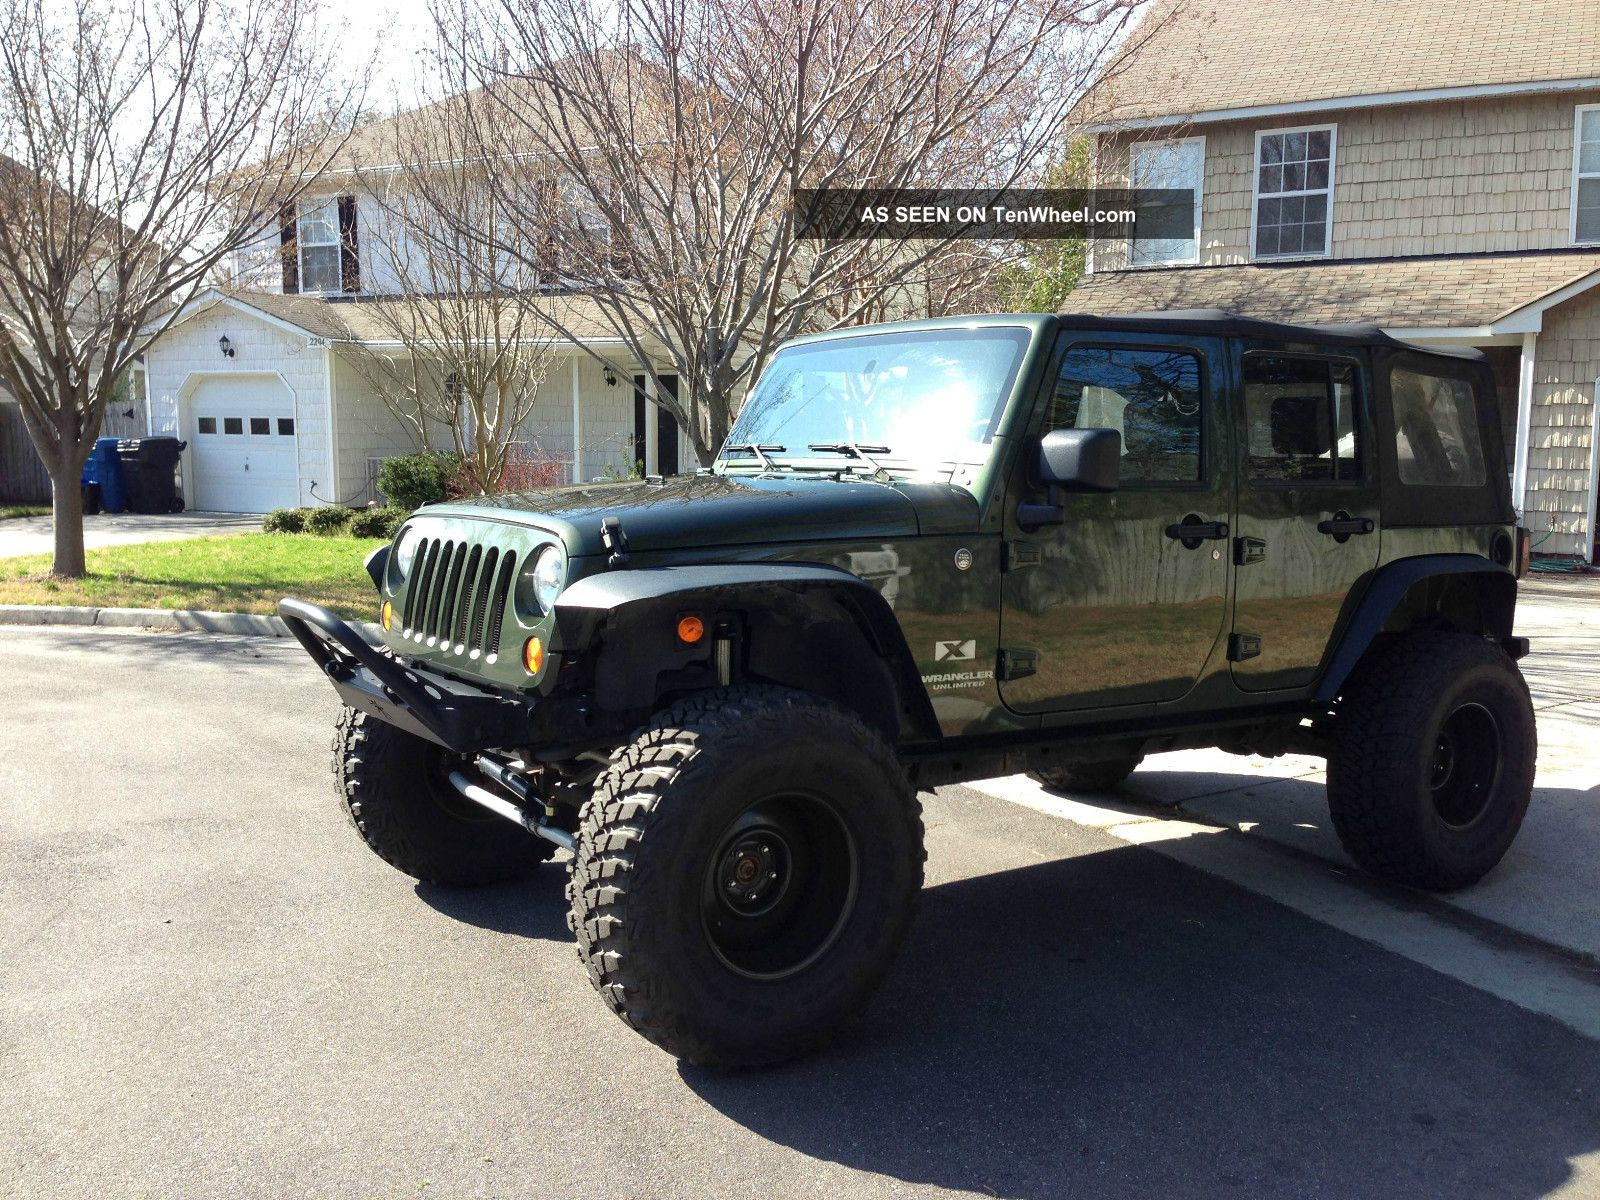 2007 jeep wrangler unlimited x 37 wheels rock krawler lifted